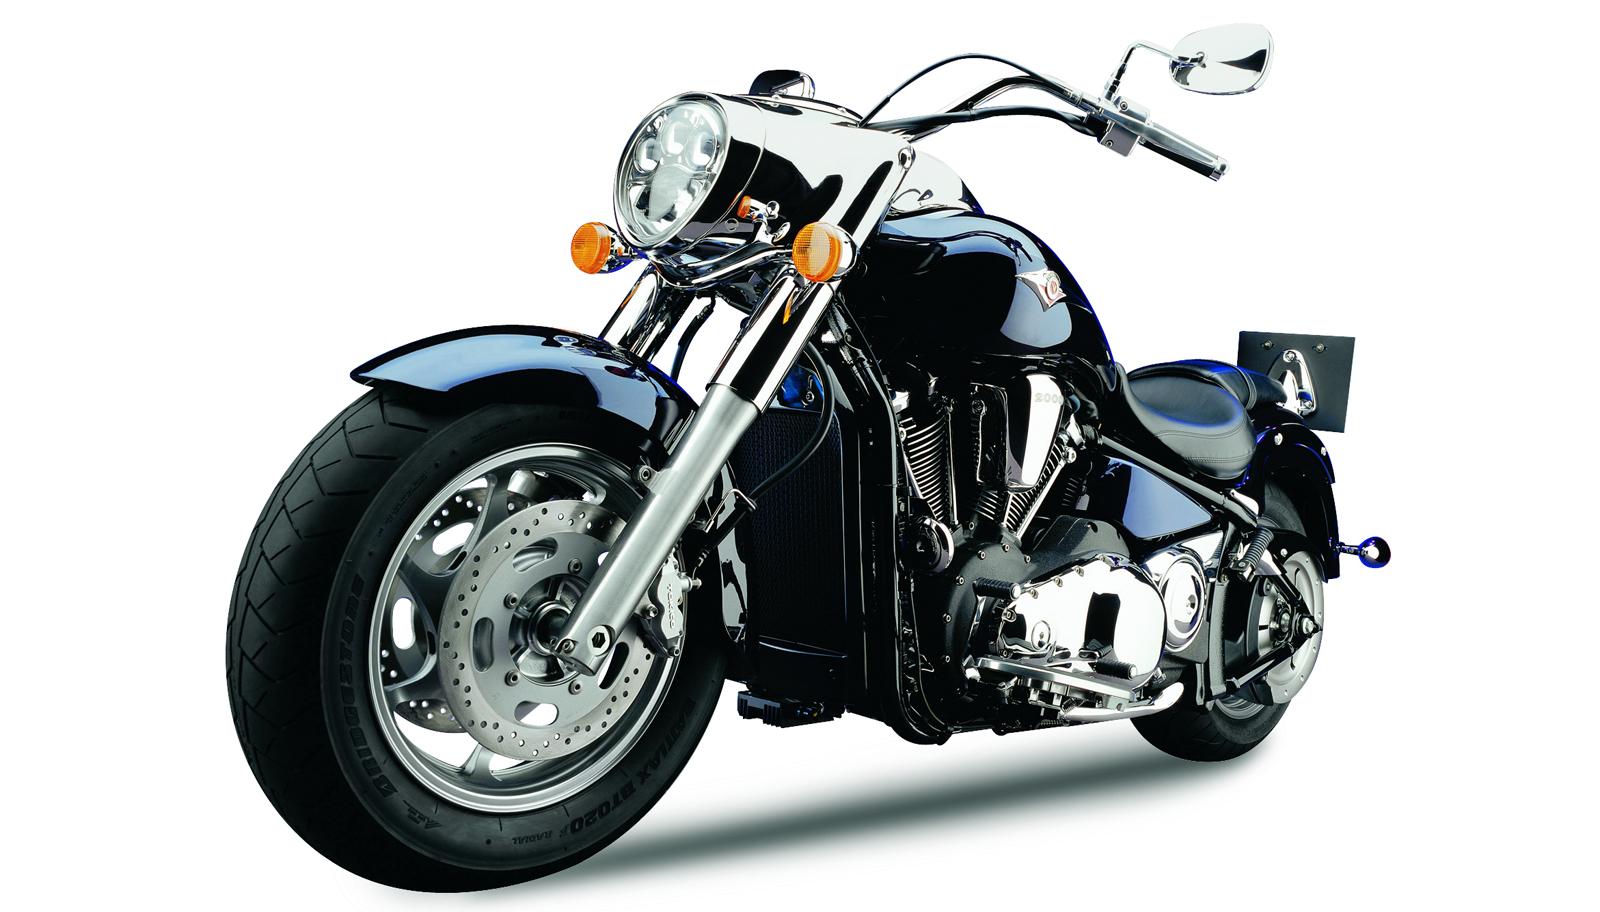 Harley Davidson clipart harley davison And Cliparts Davidson Inspiration Motorcycle